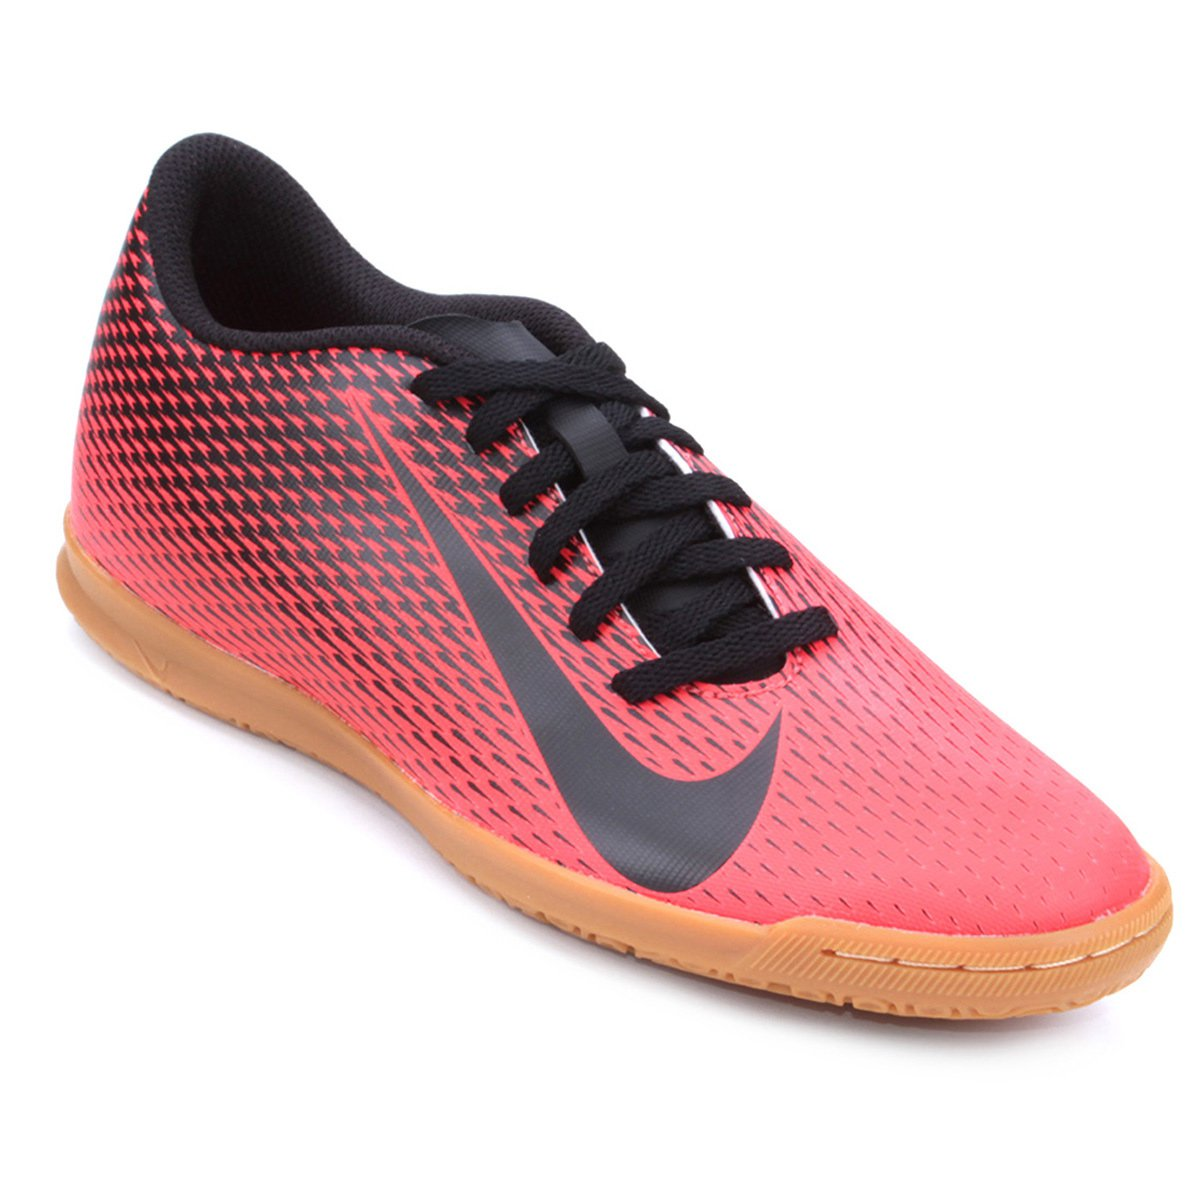 b79f37d9ce Chuteira Futsal Nike Bravata 2 IC - Preto - Compre Agora